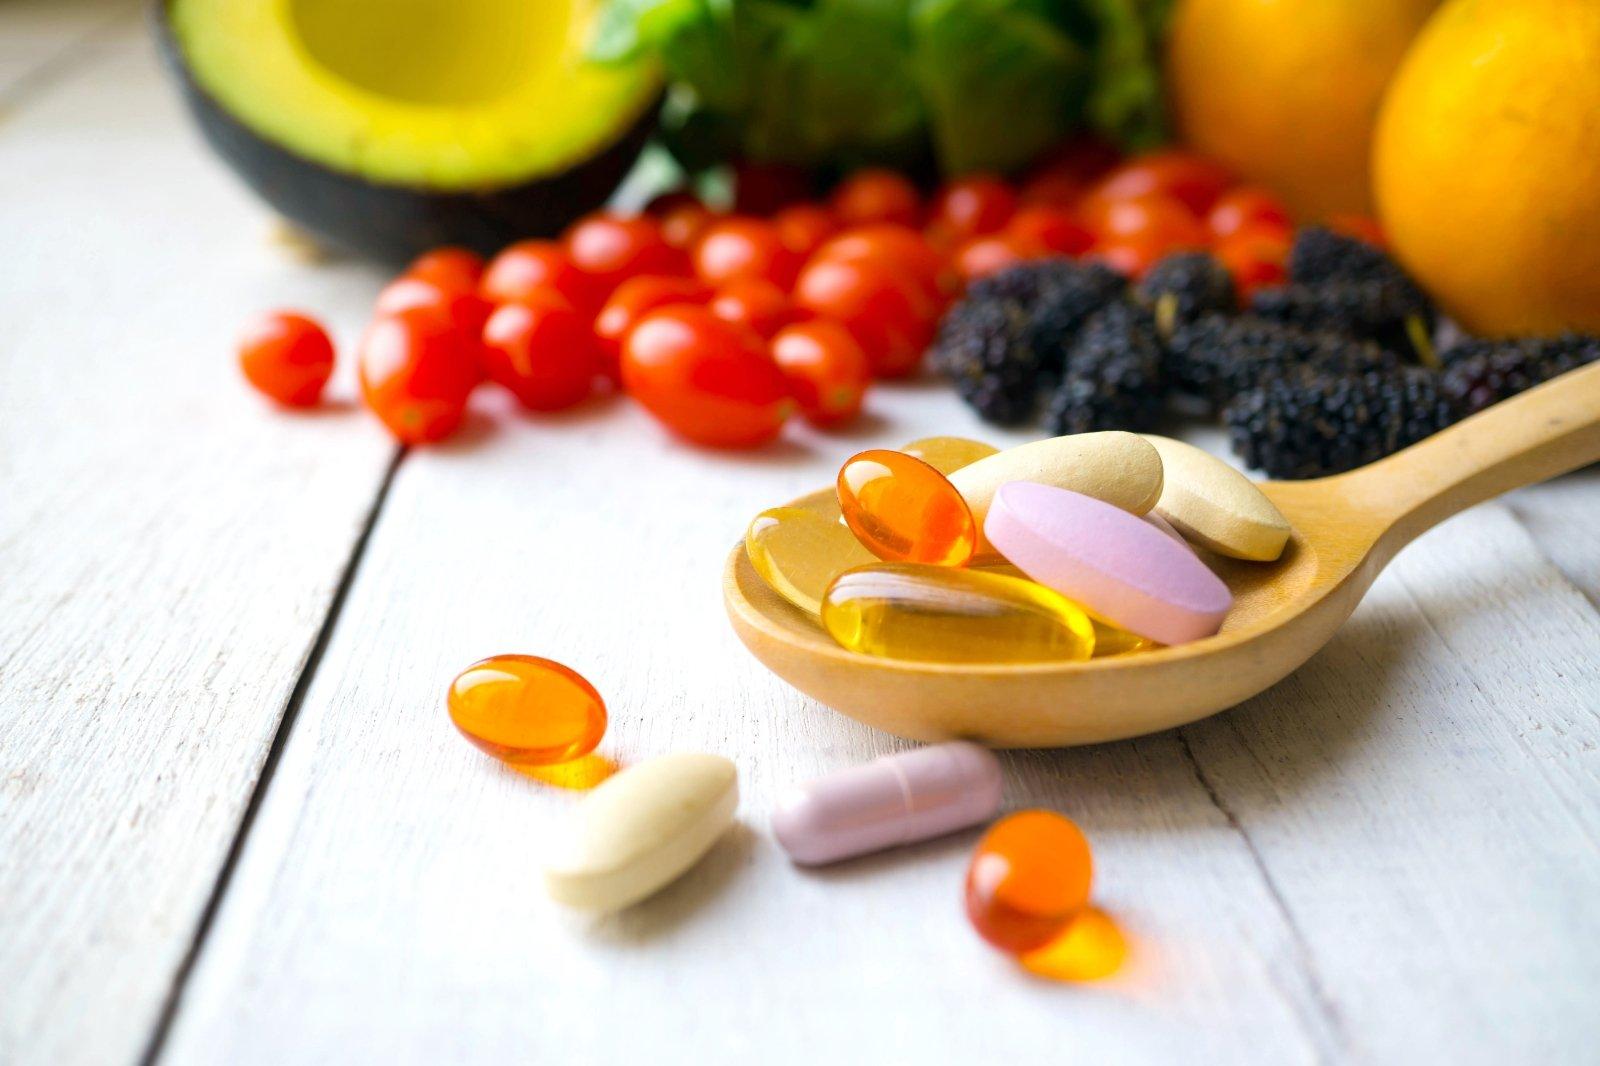 vitaminai moterims, sergančioms hipertenzija hipertenzija visi vaistai